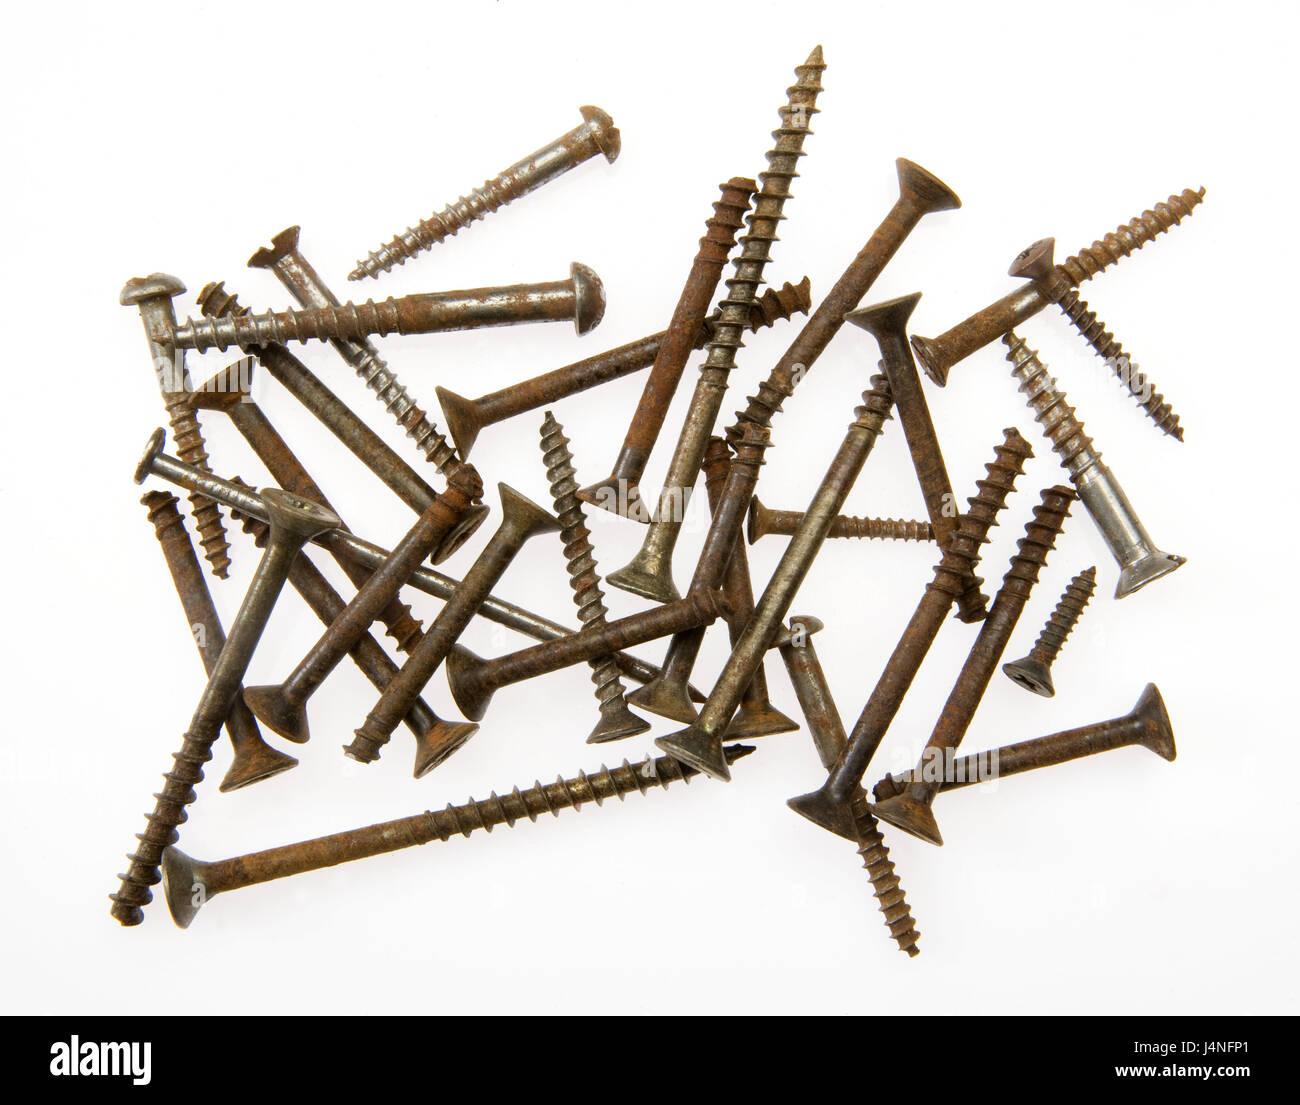 Screwing, rusty, tools, iron, metal, scrap iron, scrap metal, iron cuts, rust, waste, scrap metal, rusts, there - Stock Image